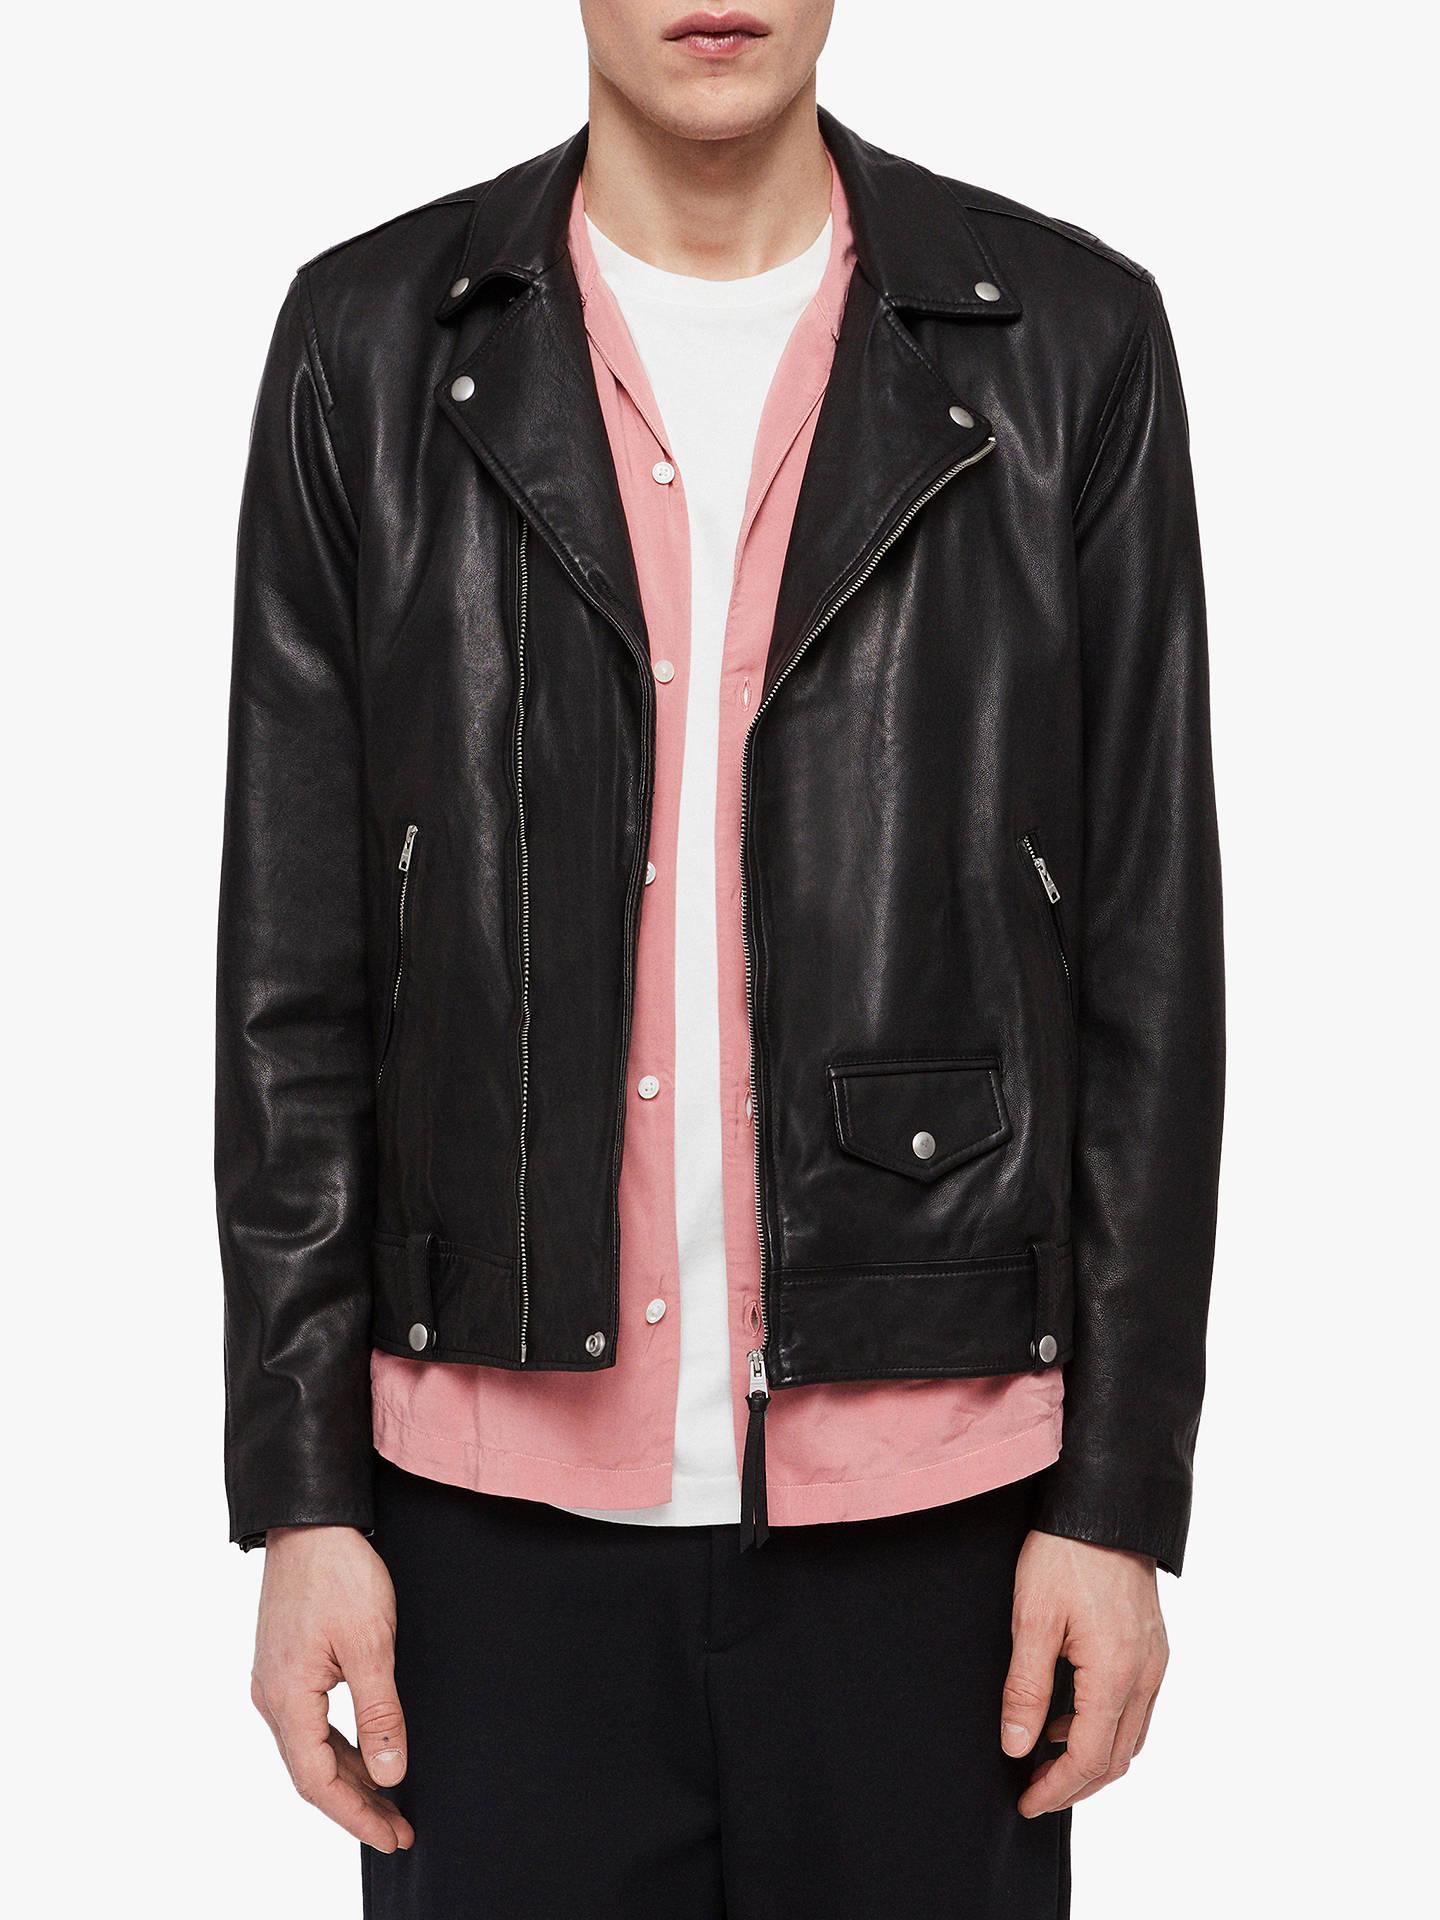 2c3a2b7945f Buy AllSaints Ace Leather Biker Jacket, Black, L Online at johnlewis.com ...